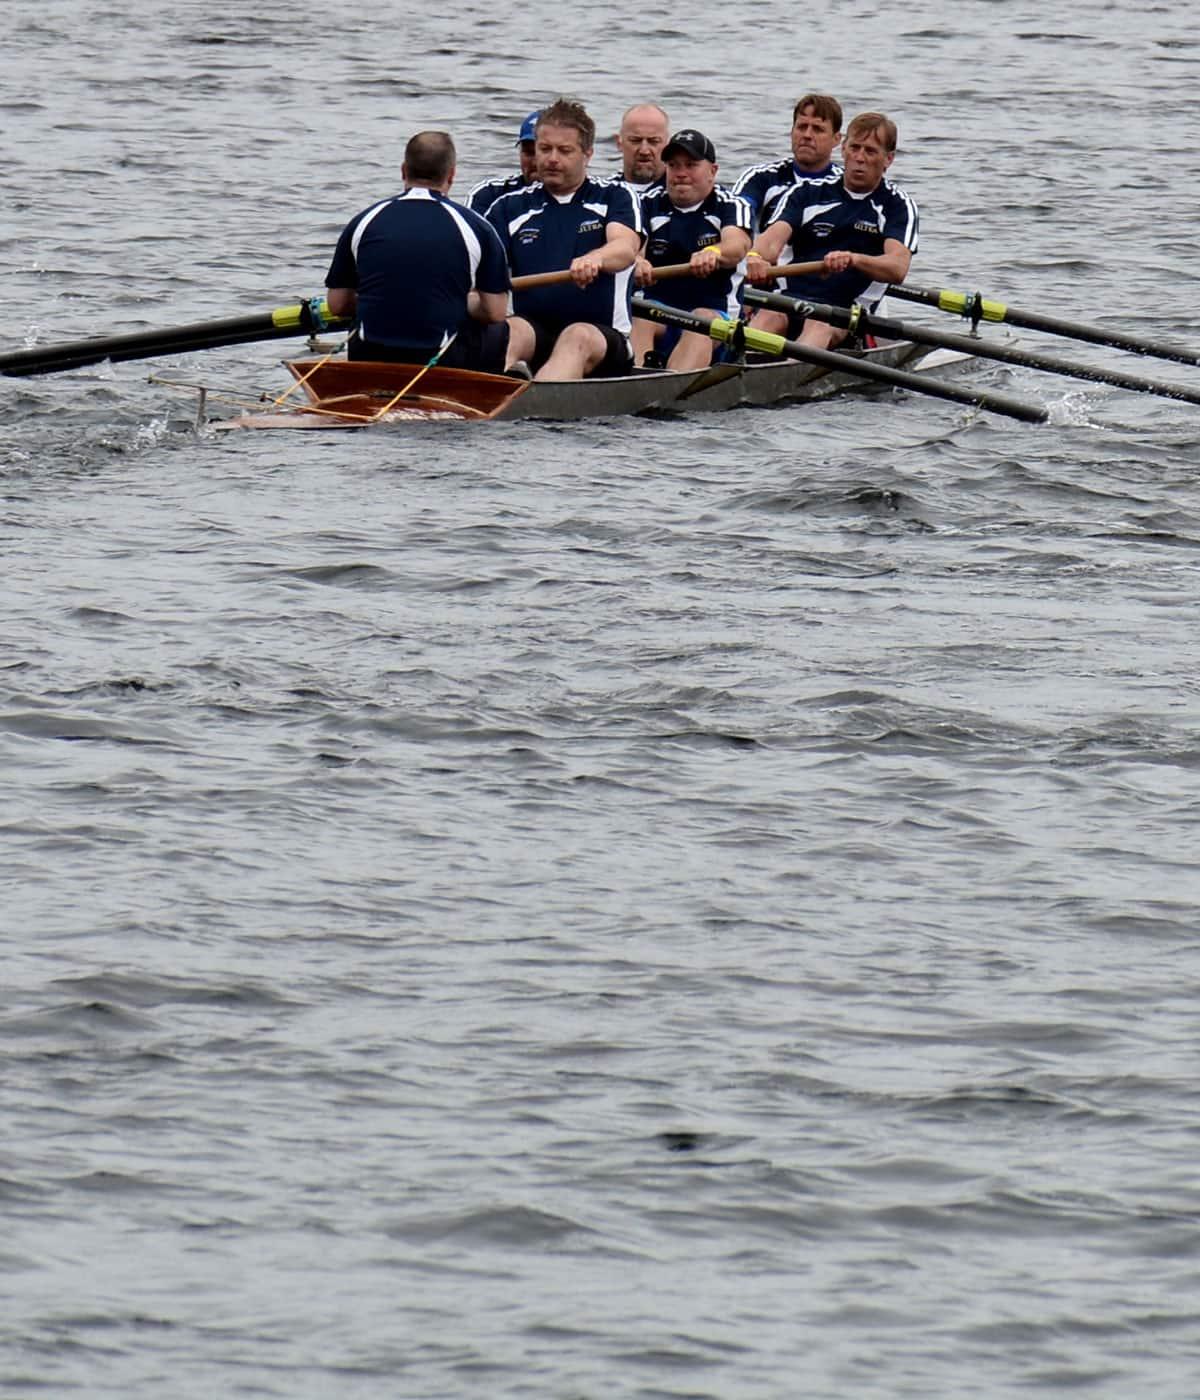 Hard ol' go: Rowing 200th Royal St. John's Regatta